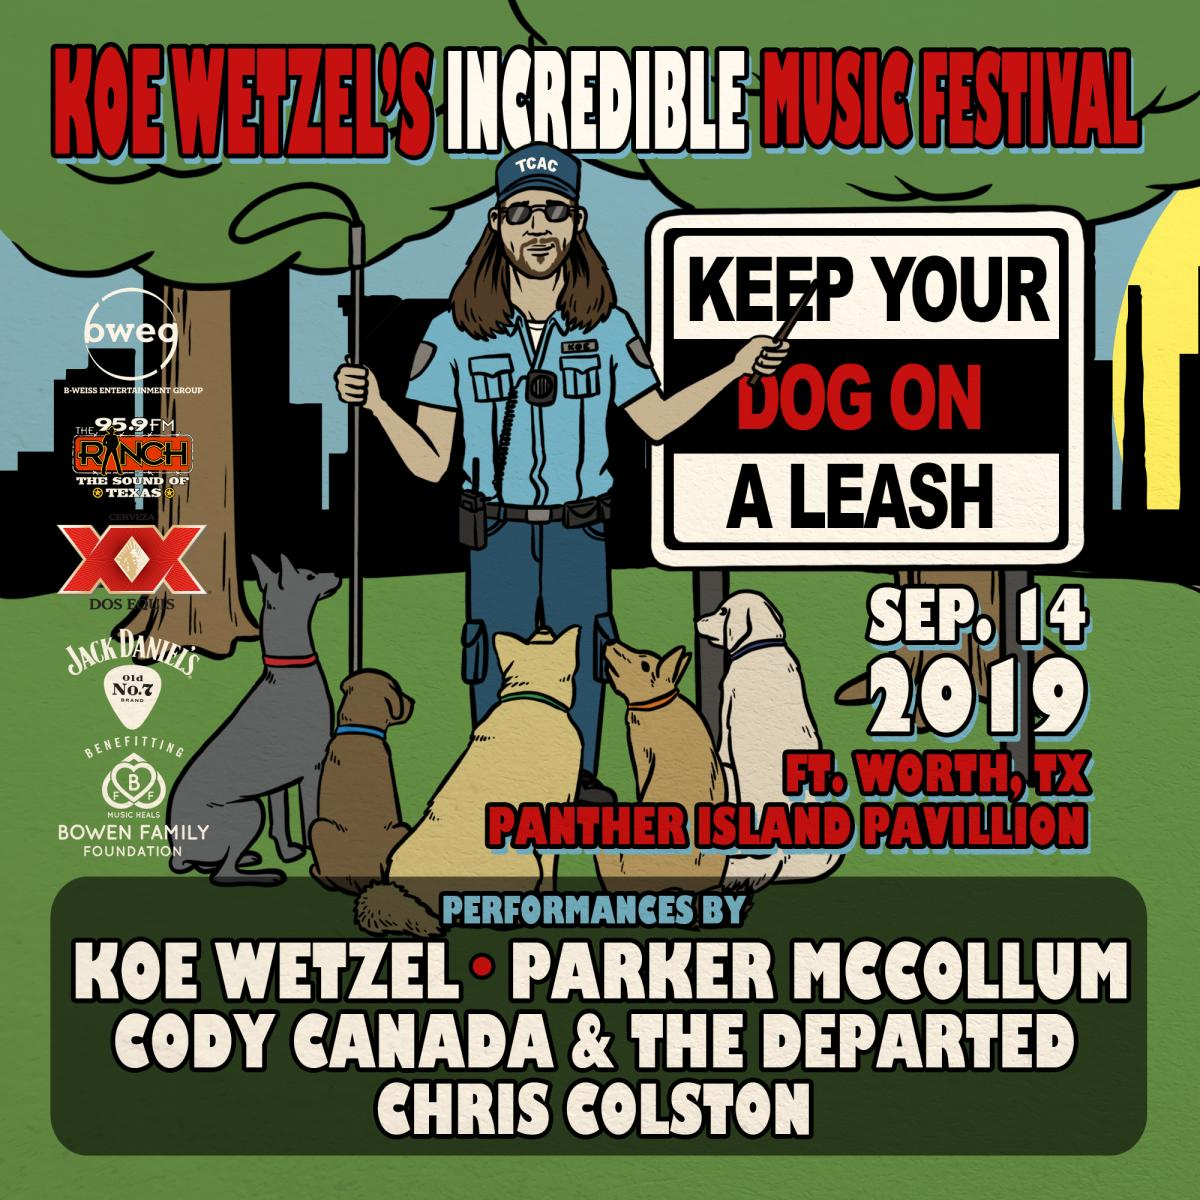 Koe Wetzel Incredible Music Festival - Panther Island Pavilion